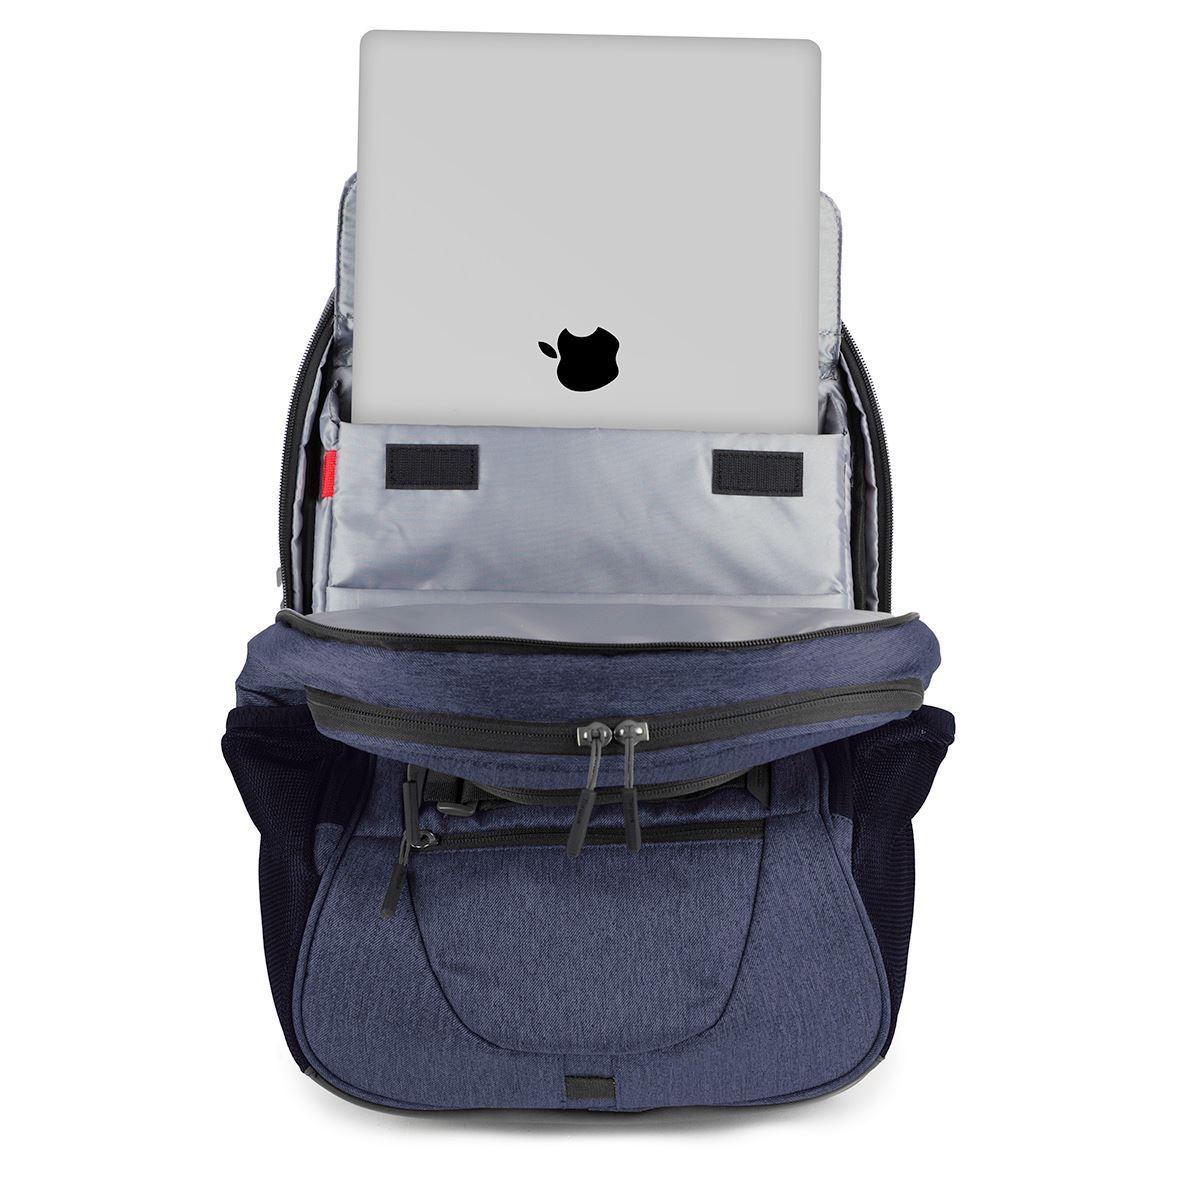 sac dos pour ordinateur portable targus urban explorer 15 6 bleu. Black Bedroom Furniture Sets. Home Design Ideas